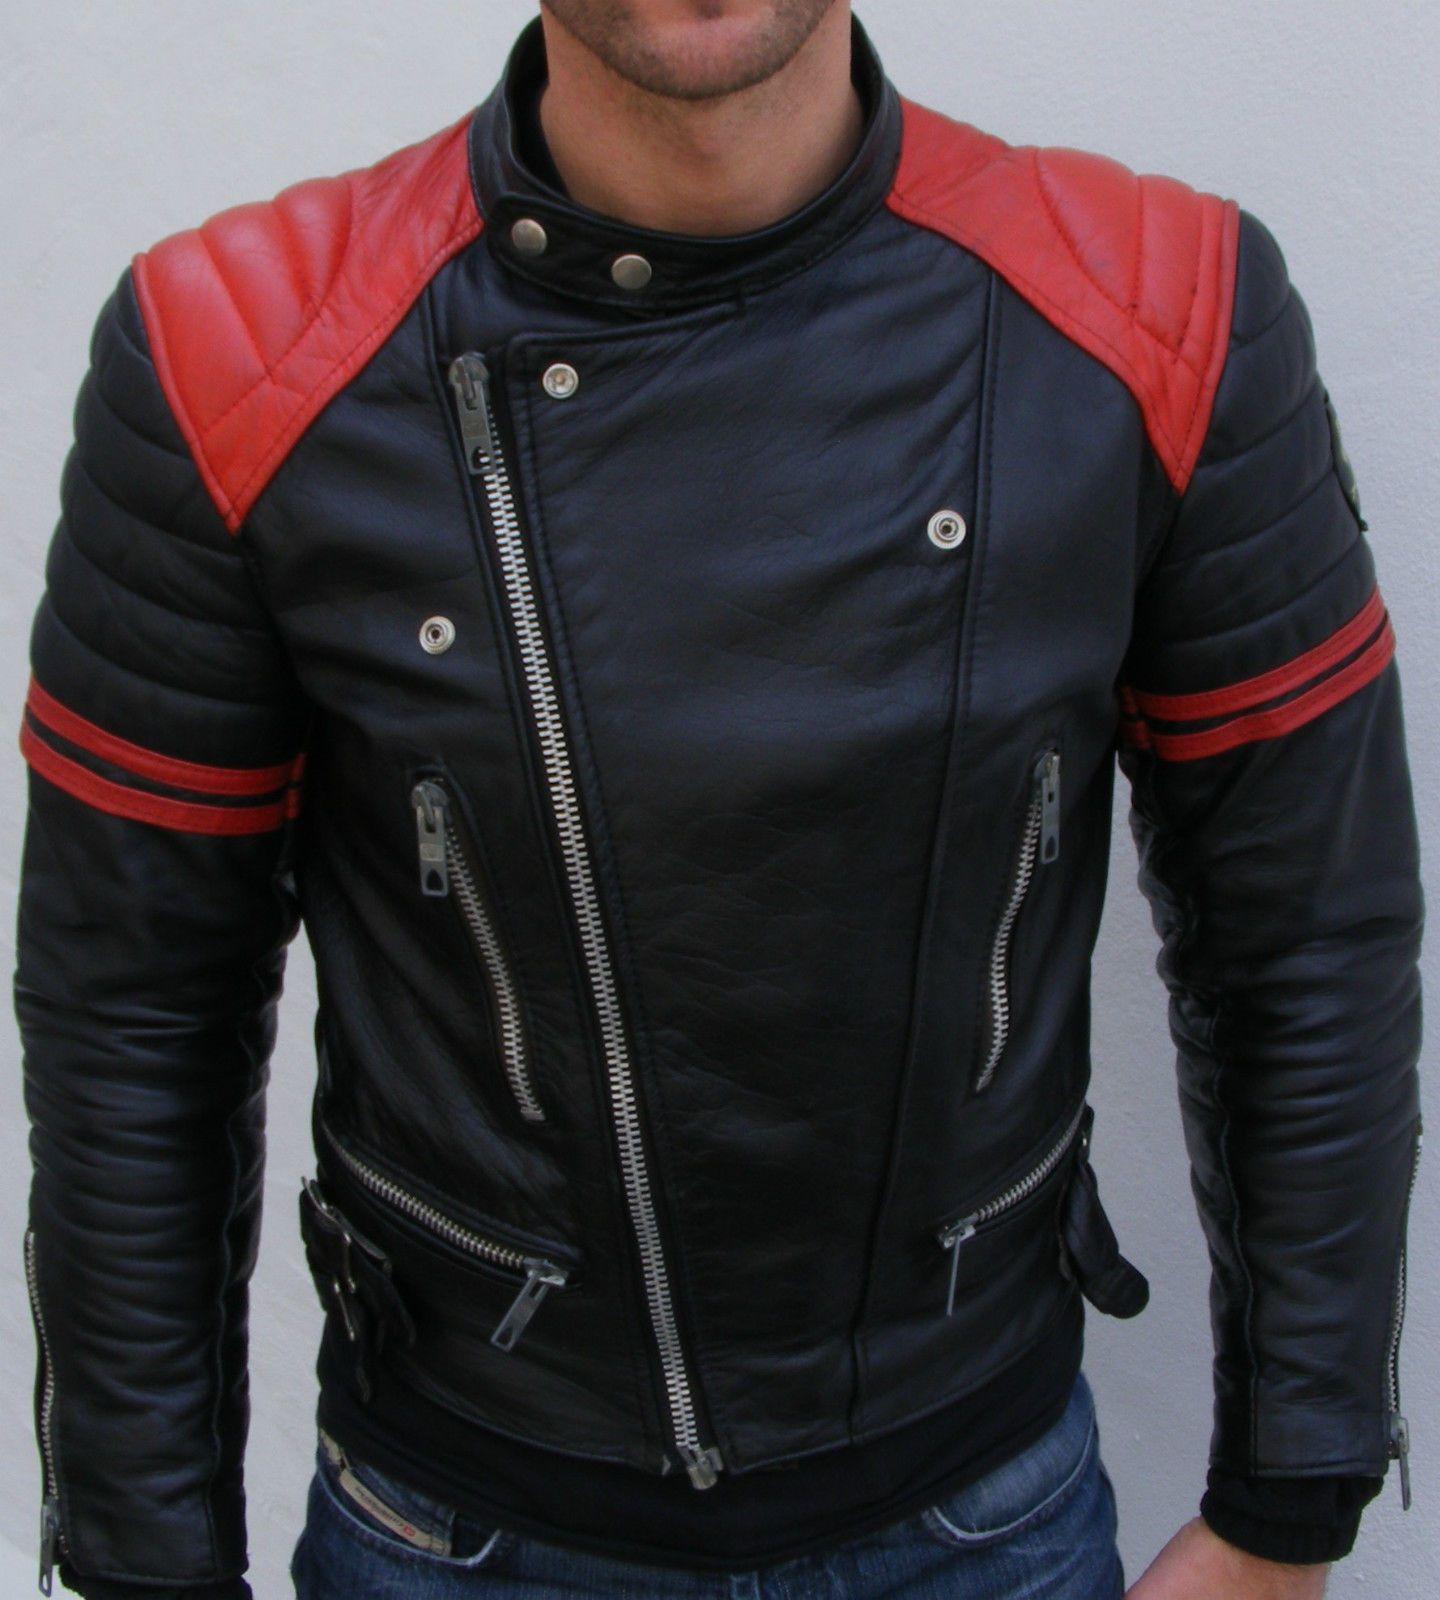 FASHION GENUINE LEATHER Jacket Stylish Biker Black /& Red